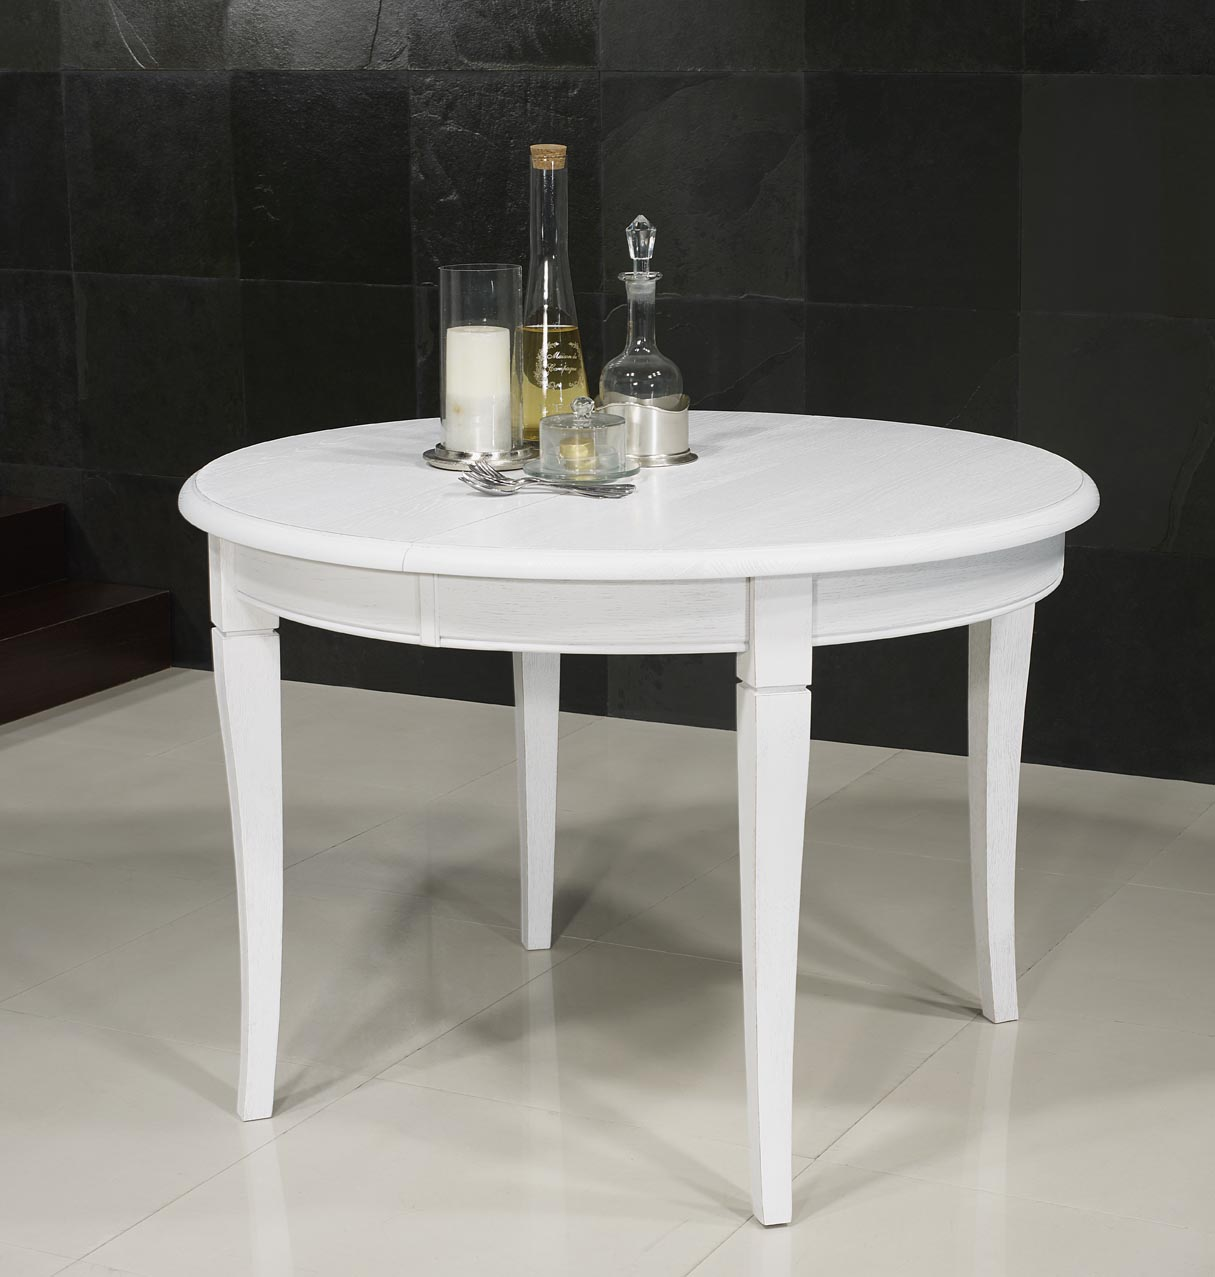 4fba3a5d7ffeed Table ronde en Chêne massif de style Louis philippe DIAMETRE 120 Finition  Chêne Brossé Ivoire , meuble en Chêne massif